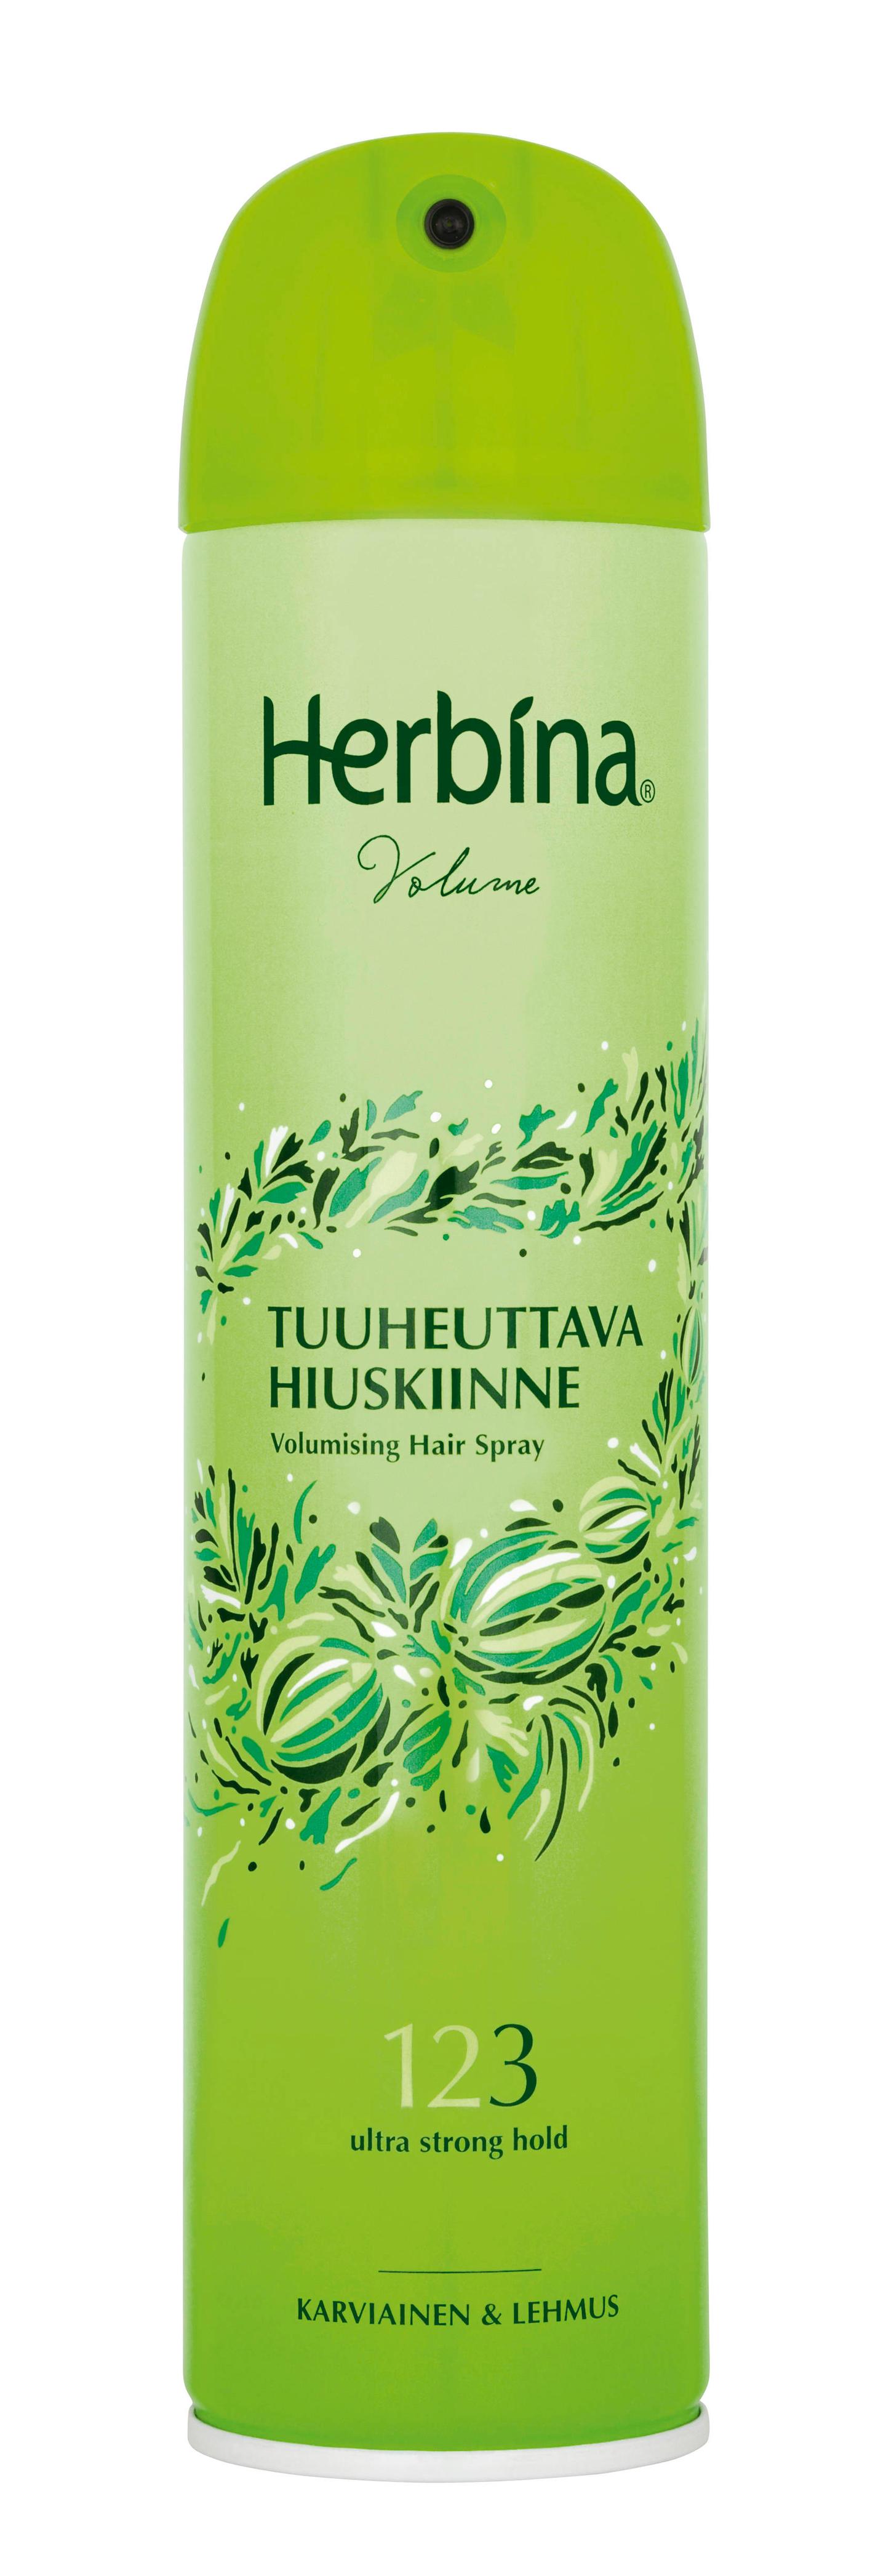 Herbina Volume hiuskiinne 250ml – K-Ruoka cdd5596e0e